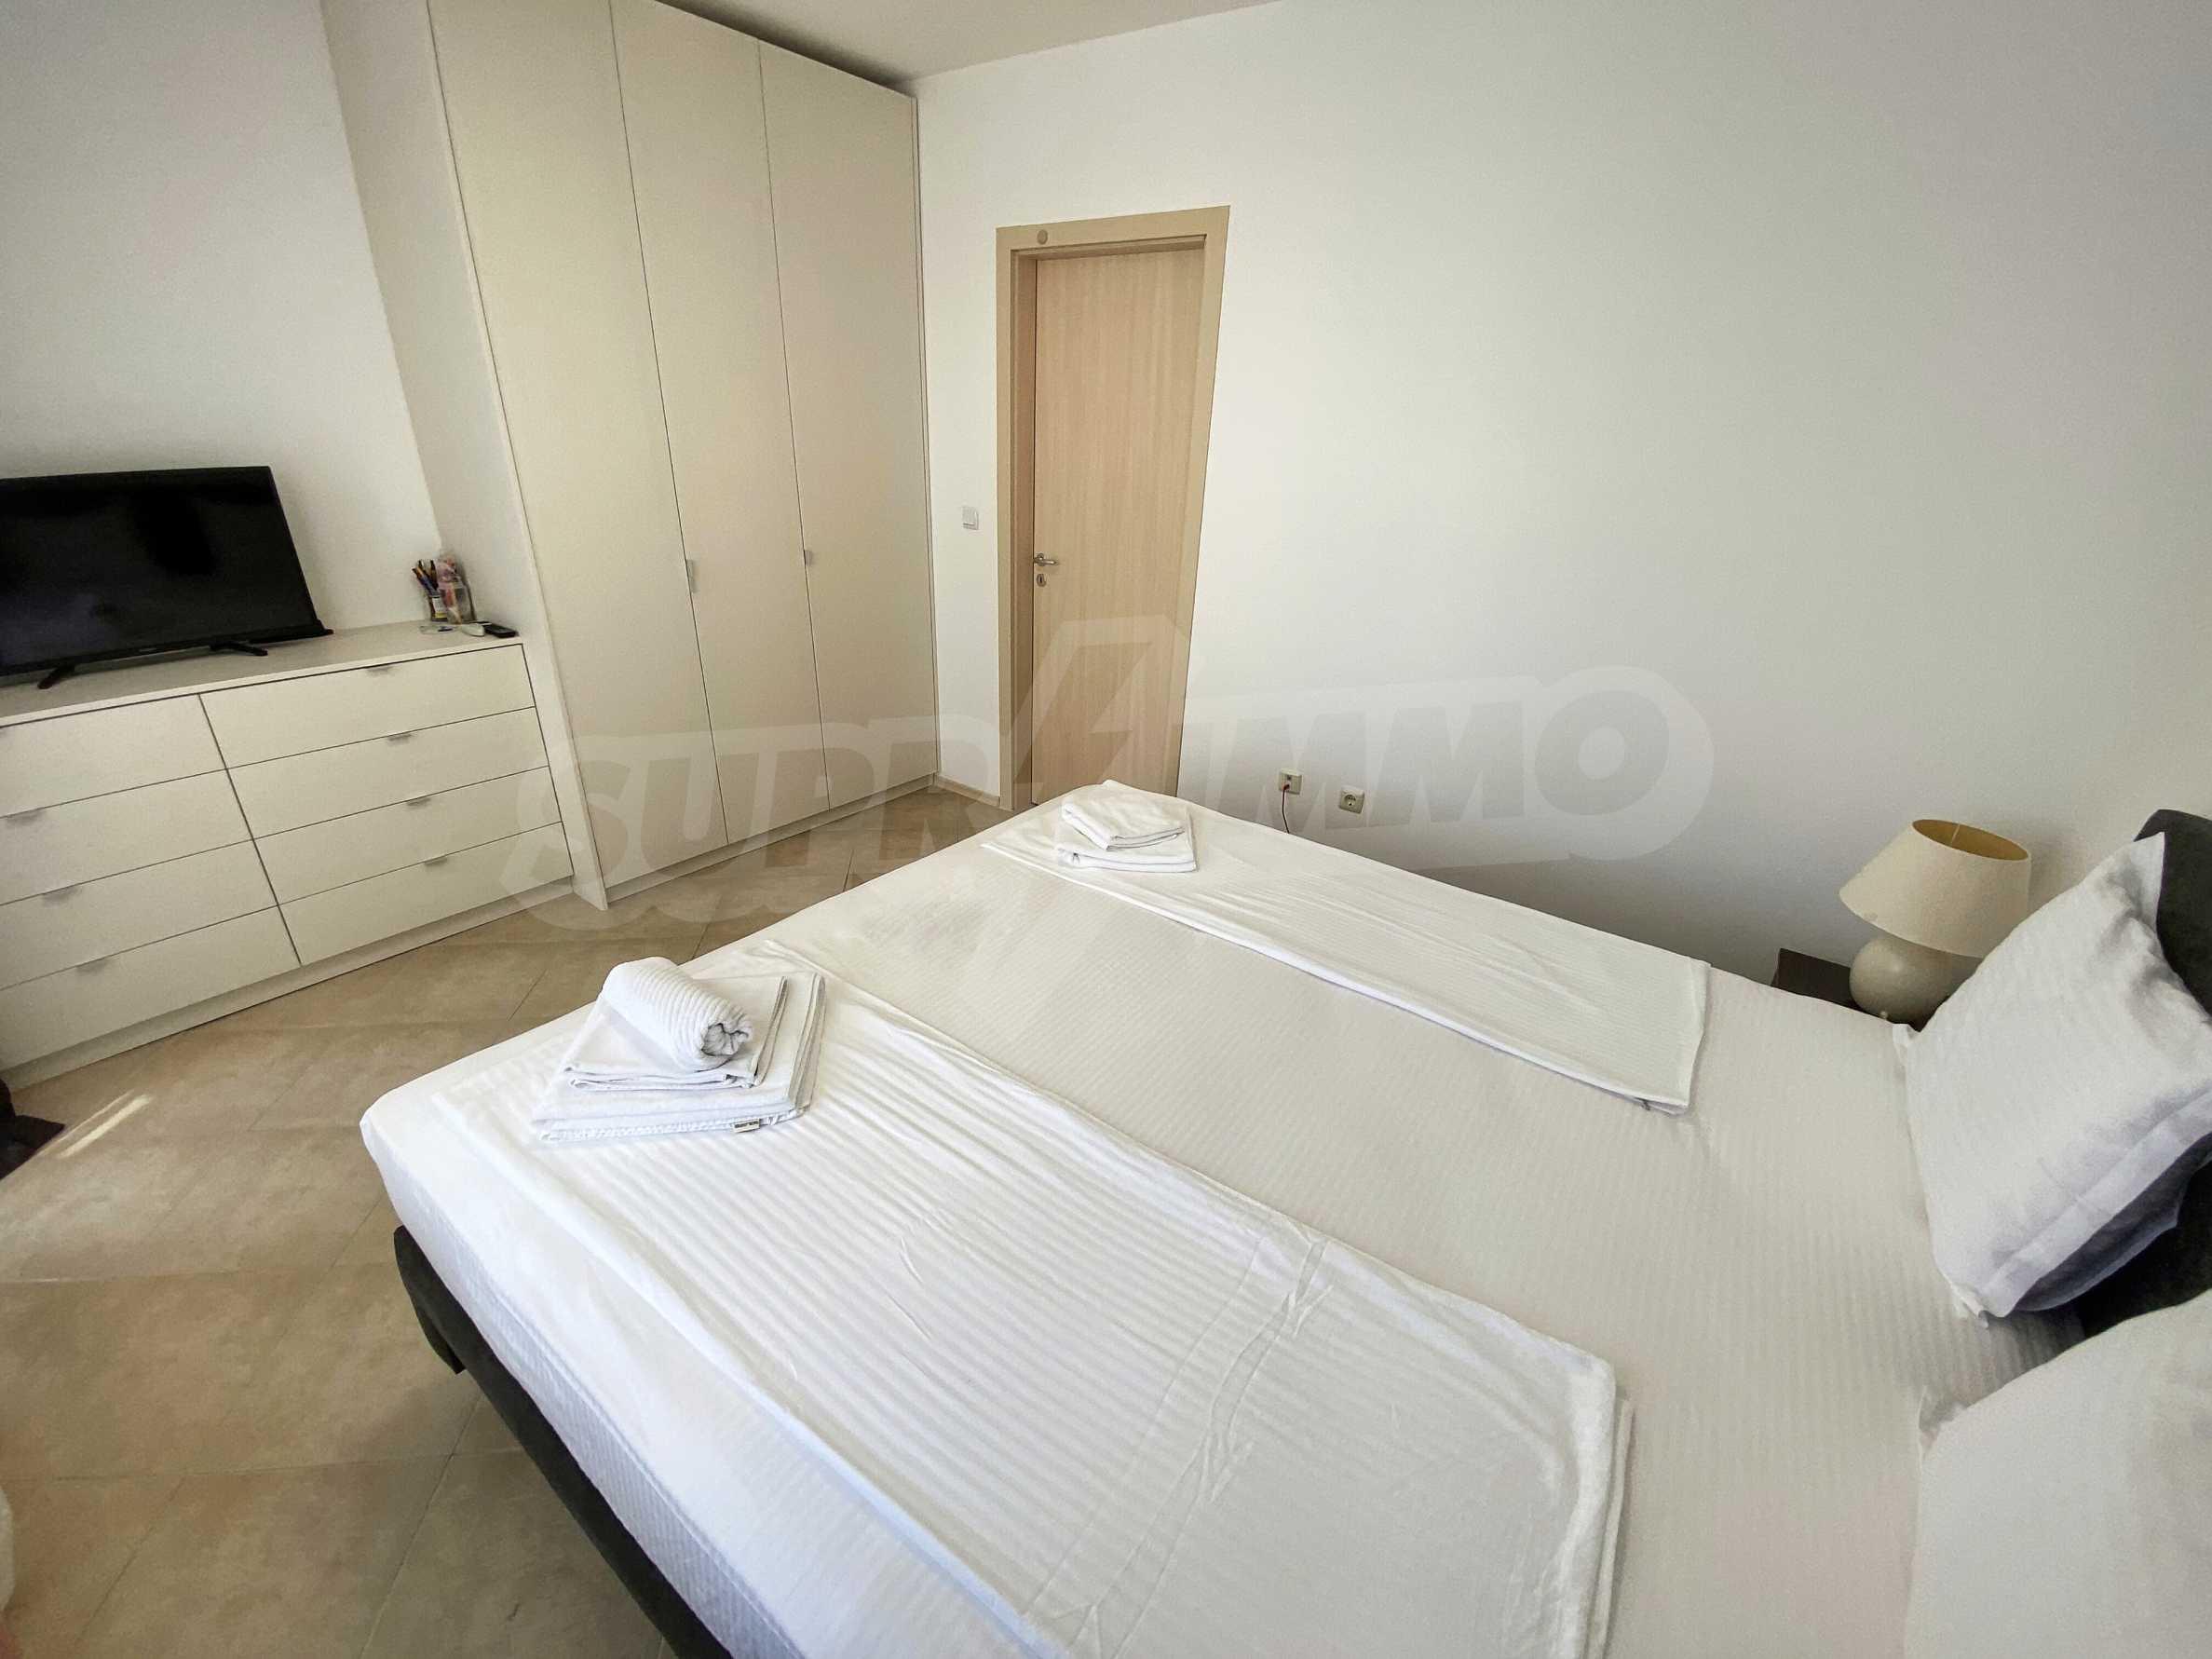 Тристаен апартамент близо до плажа в комплекс Емберли в Лозенец (ап. №201) 19